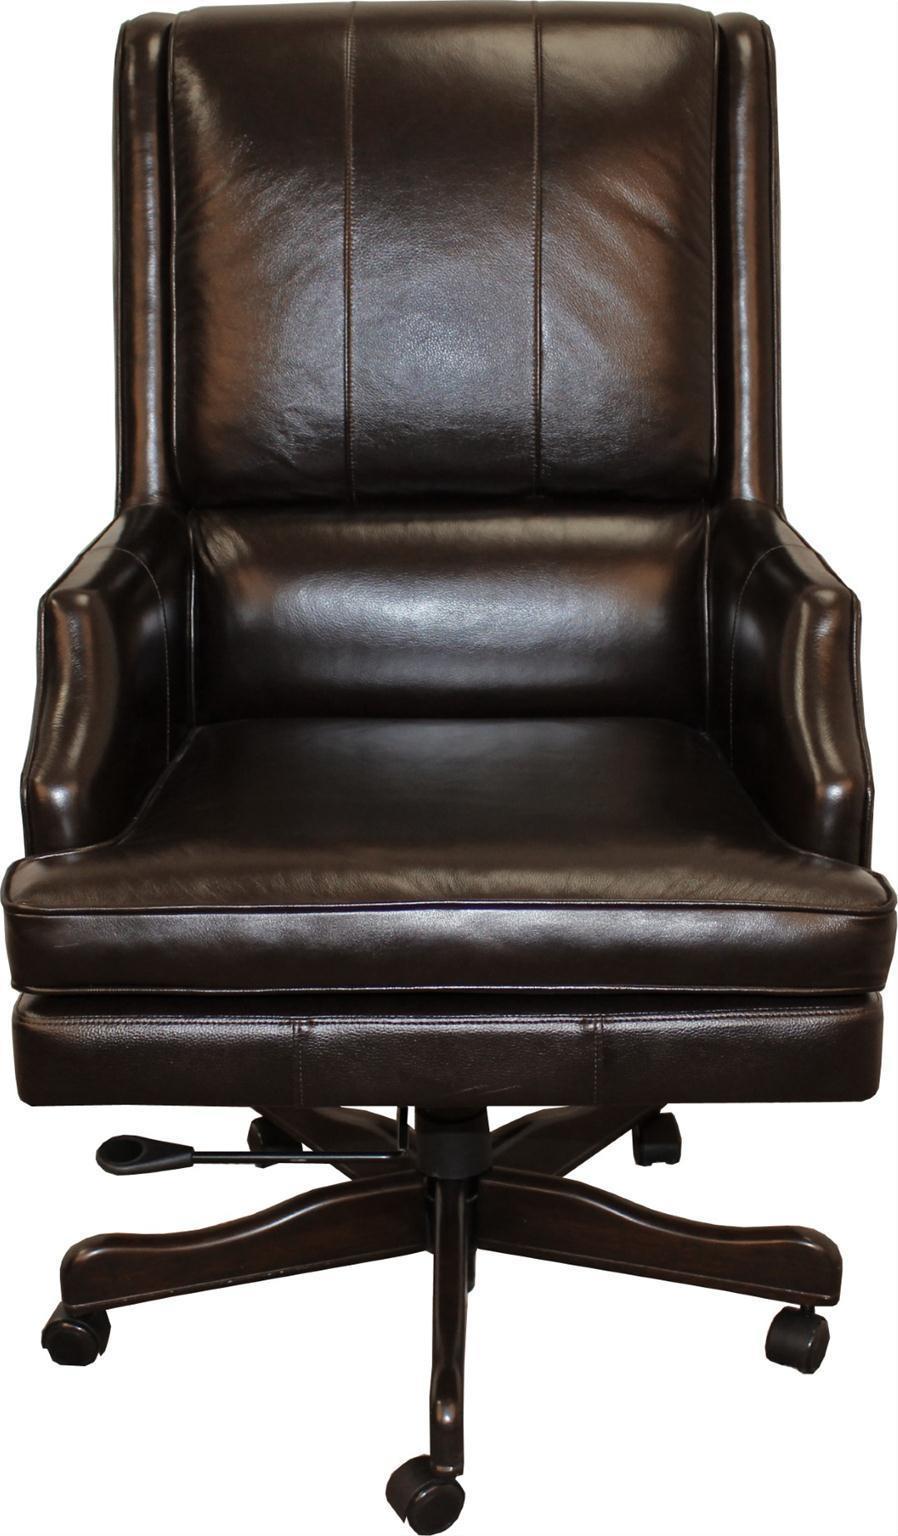 Parker Scott Easton Leather Desk Chair  Morris Home